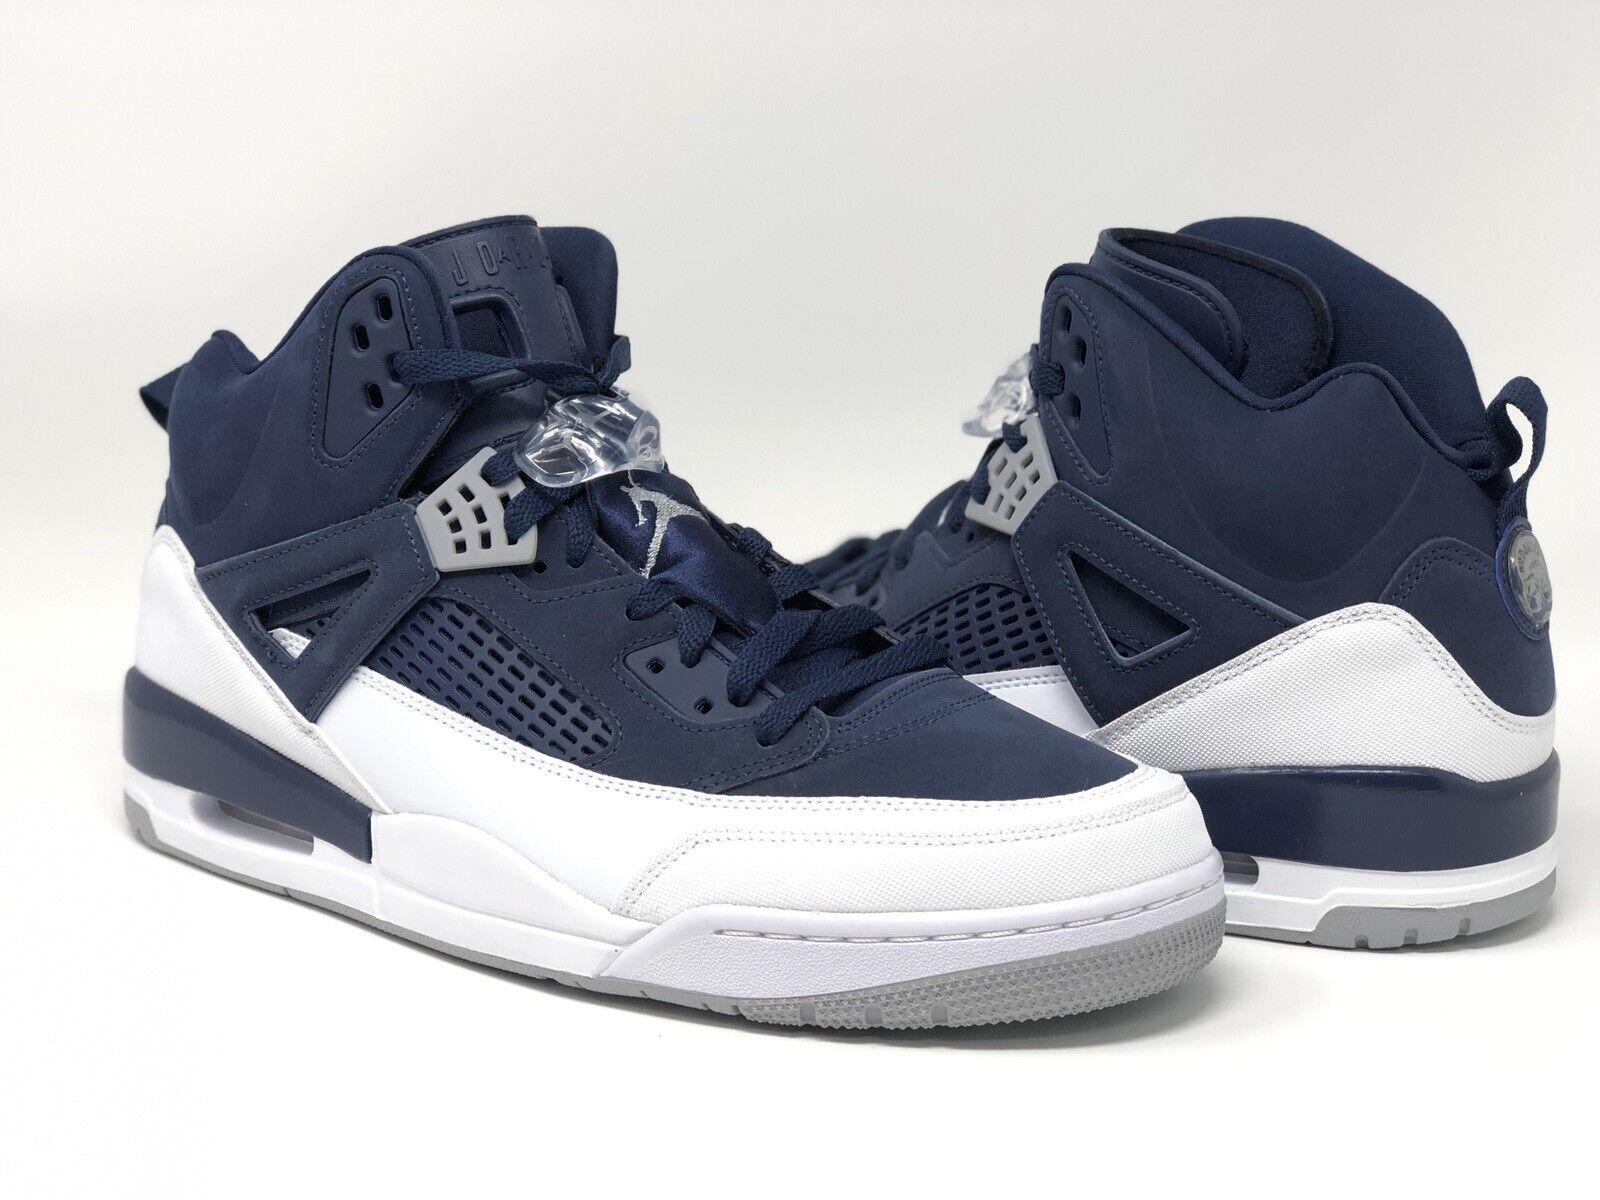 Mens Nike JORDAN SPIZIKE scarpe -Midnight Navy Navy Navy -Reg  175 -315371 406 -Sz 13 -New bc8778